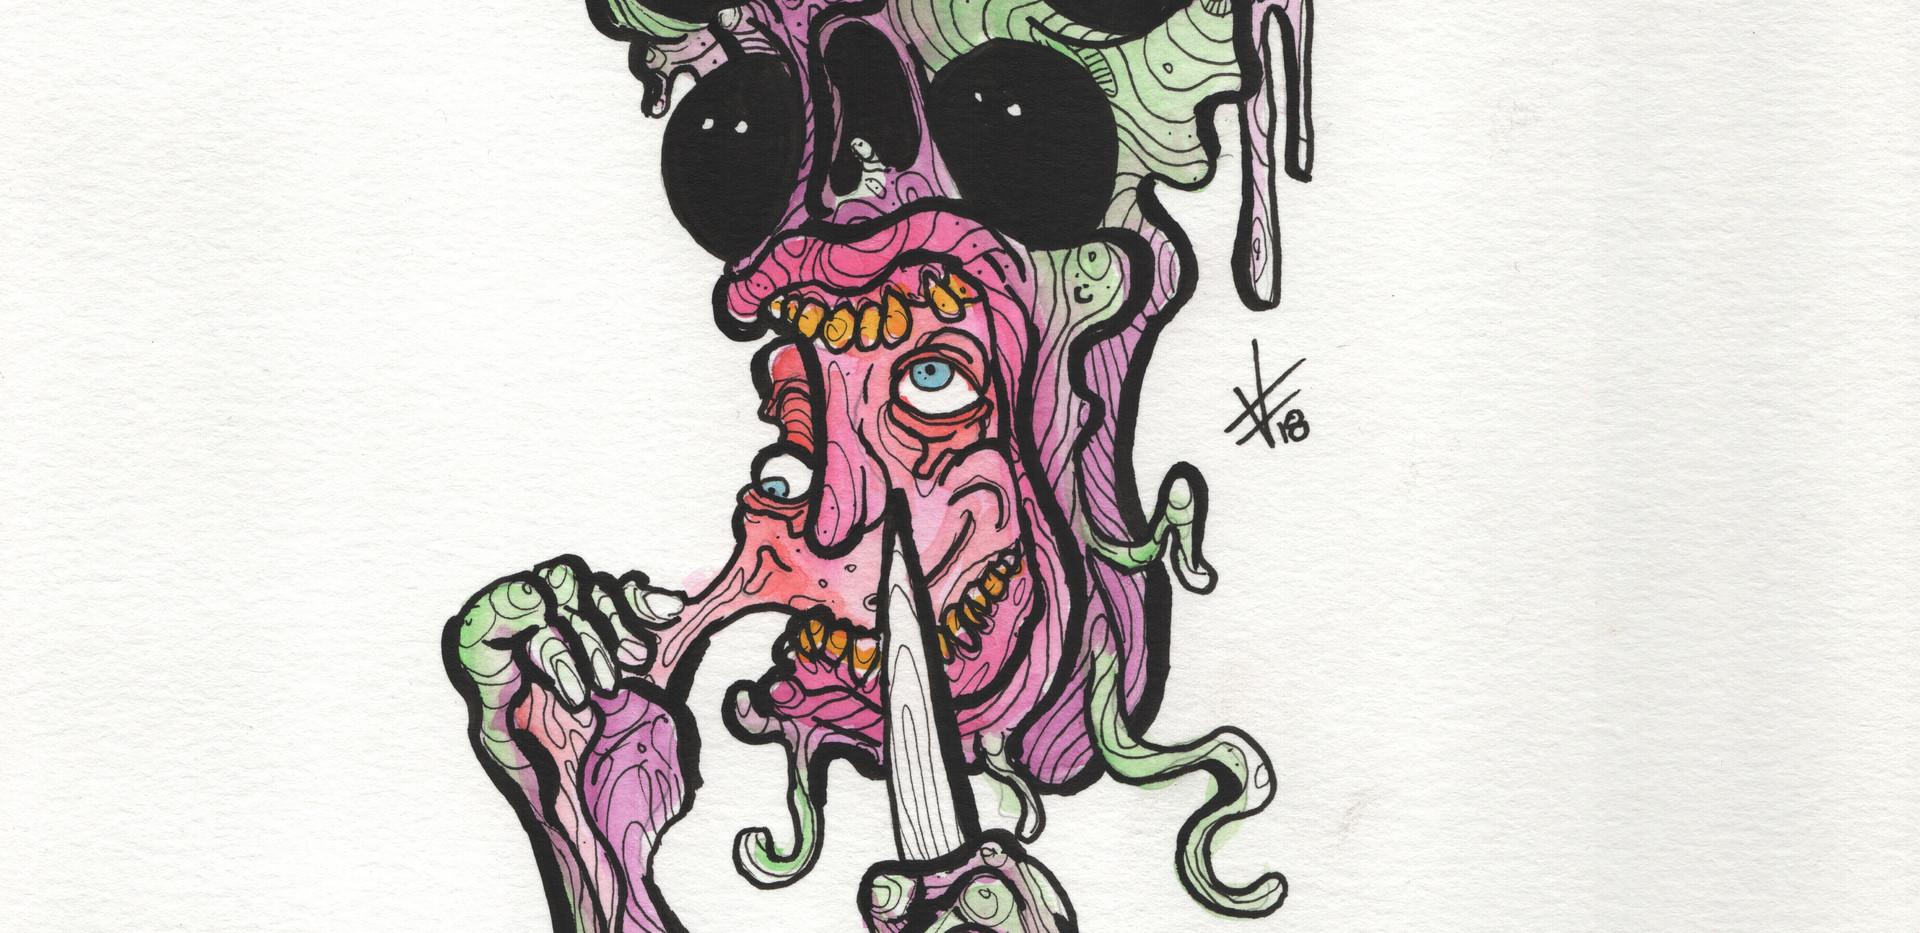 Monster - 015.jpeg